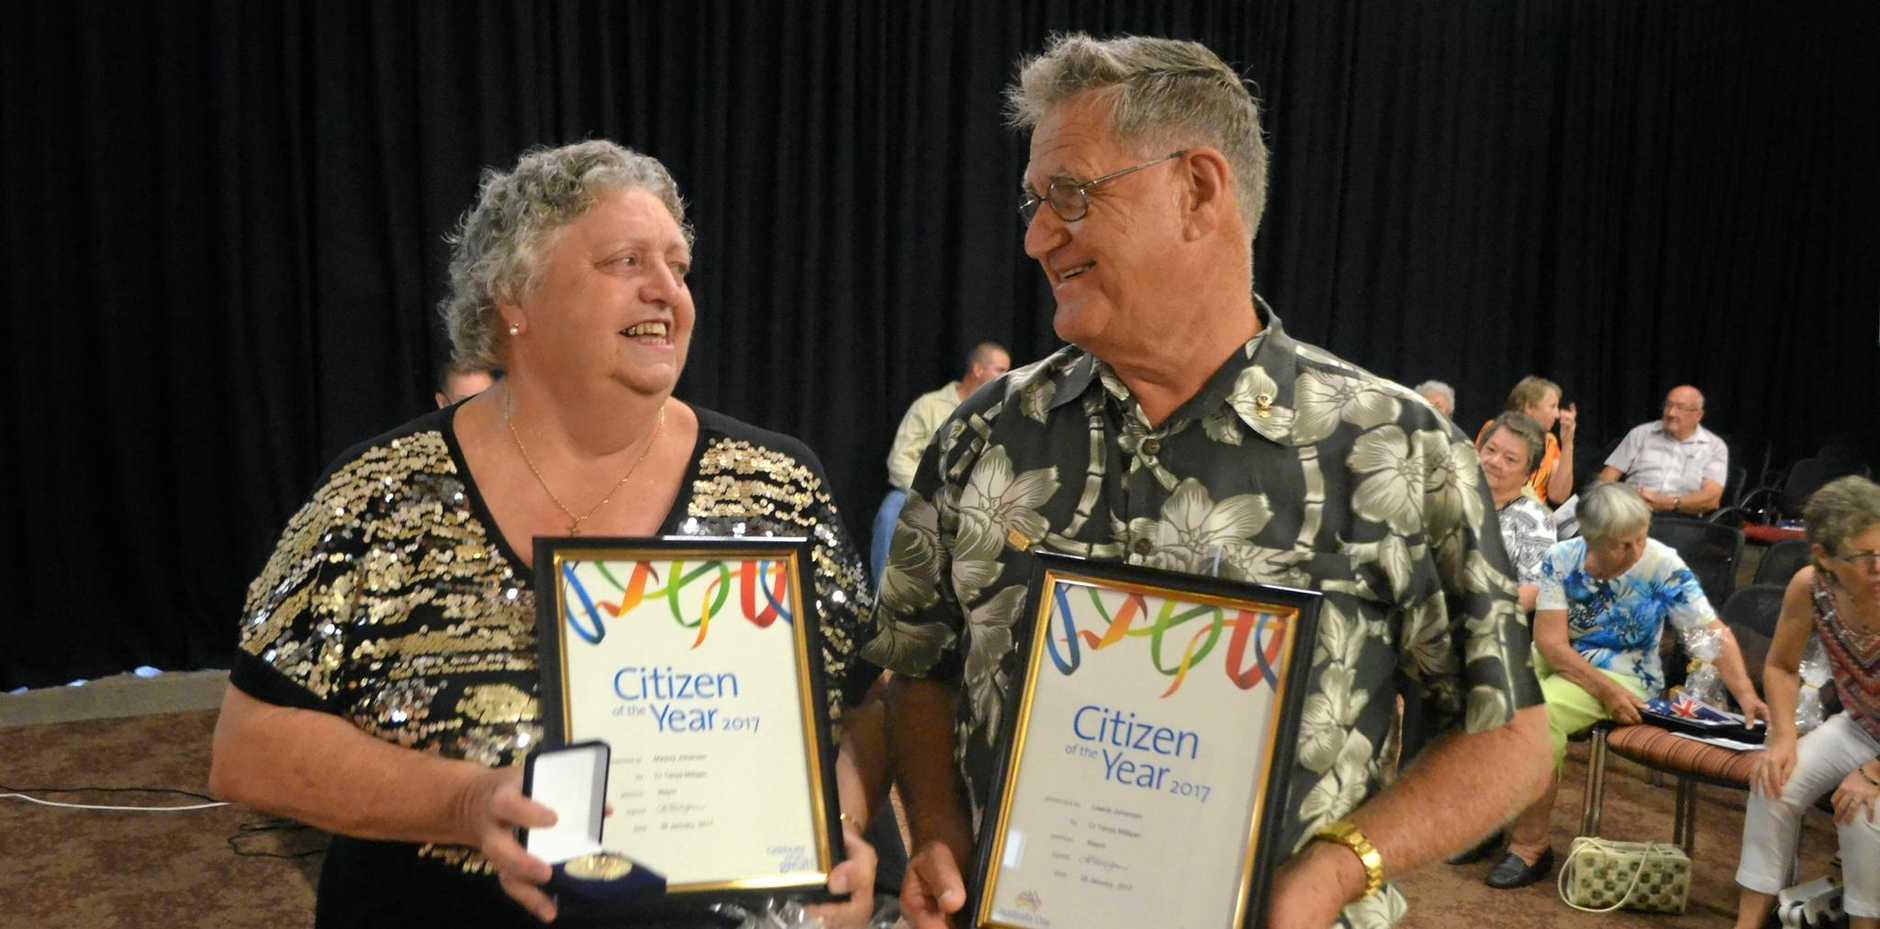 LOCKYER'S FINEST: The Johansen's win the 2017 Lockyer Valley Citizen of the Year Award.